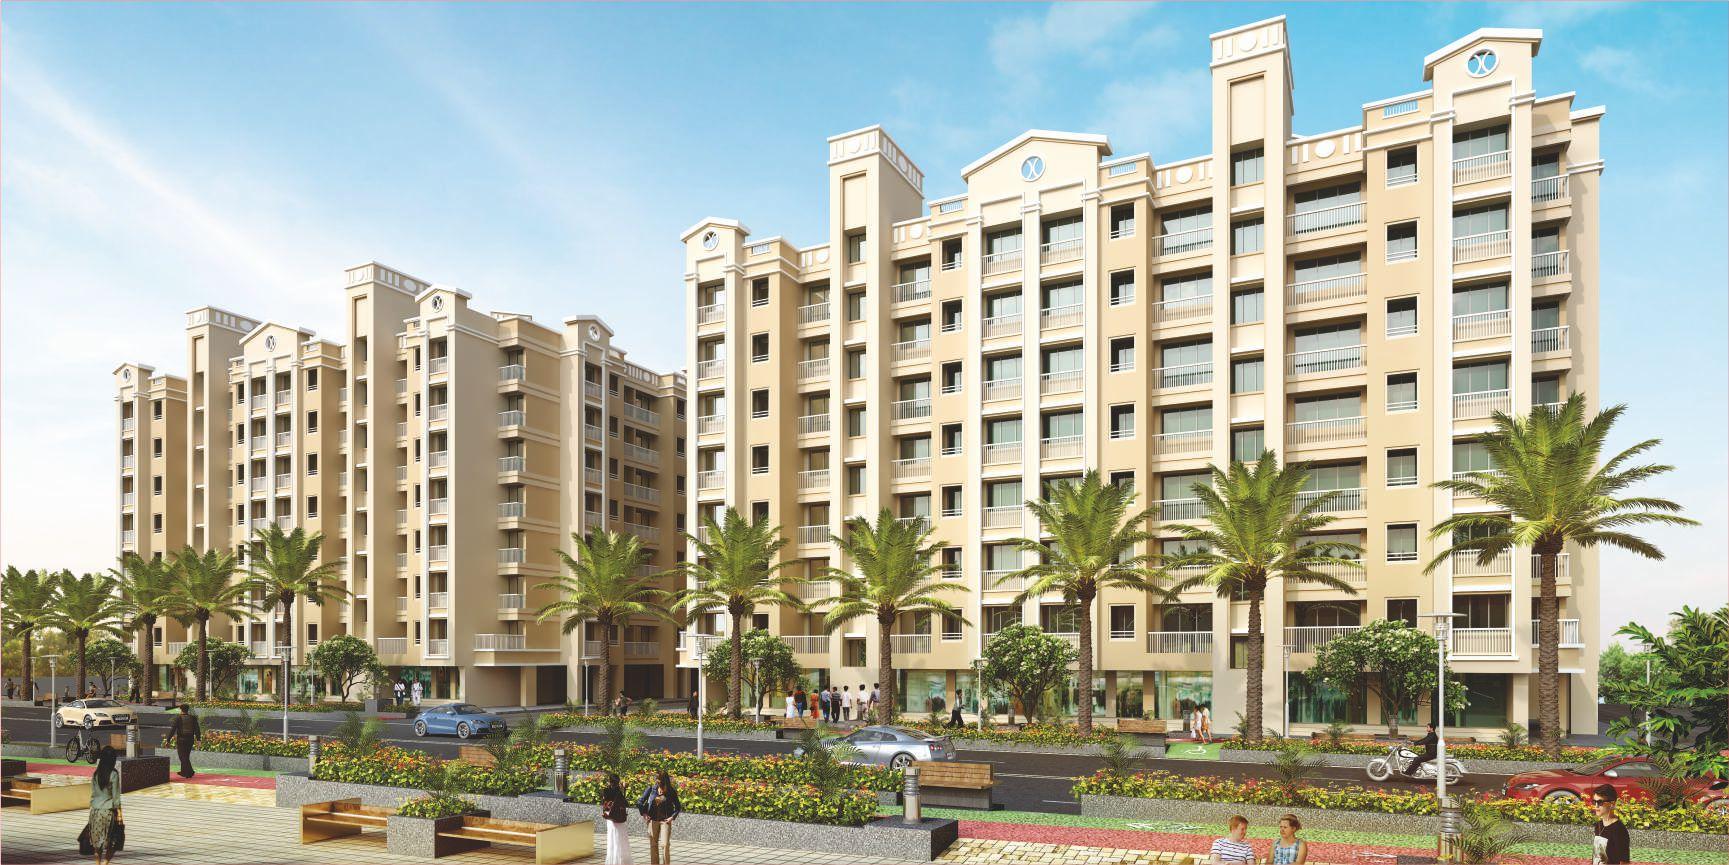 1Rk, 1 & 2 BHK Flats in Vangani Panvel Mumbai in Tulsi V City - Sqmtrs